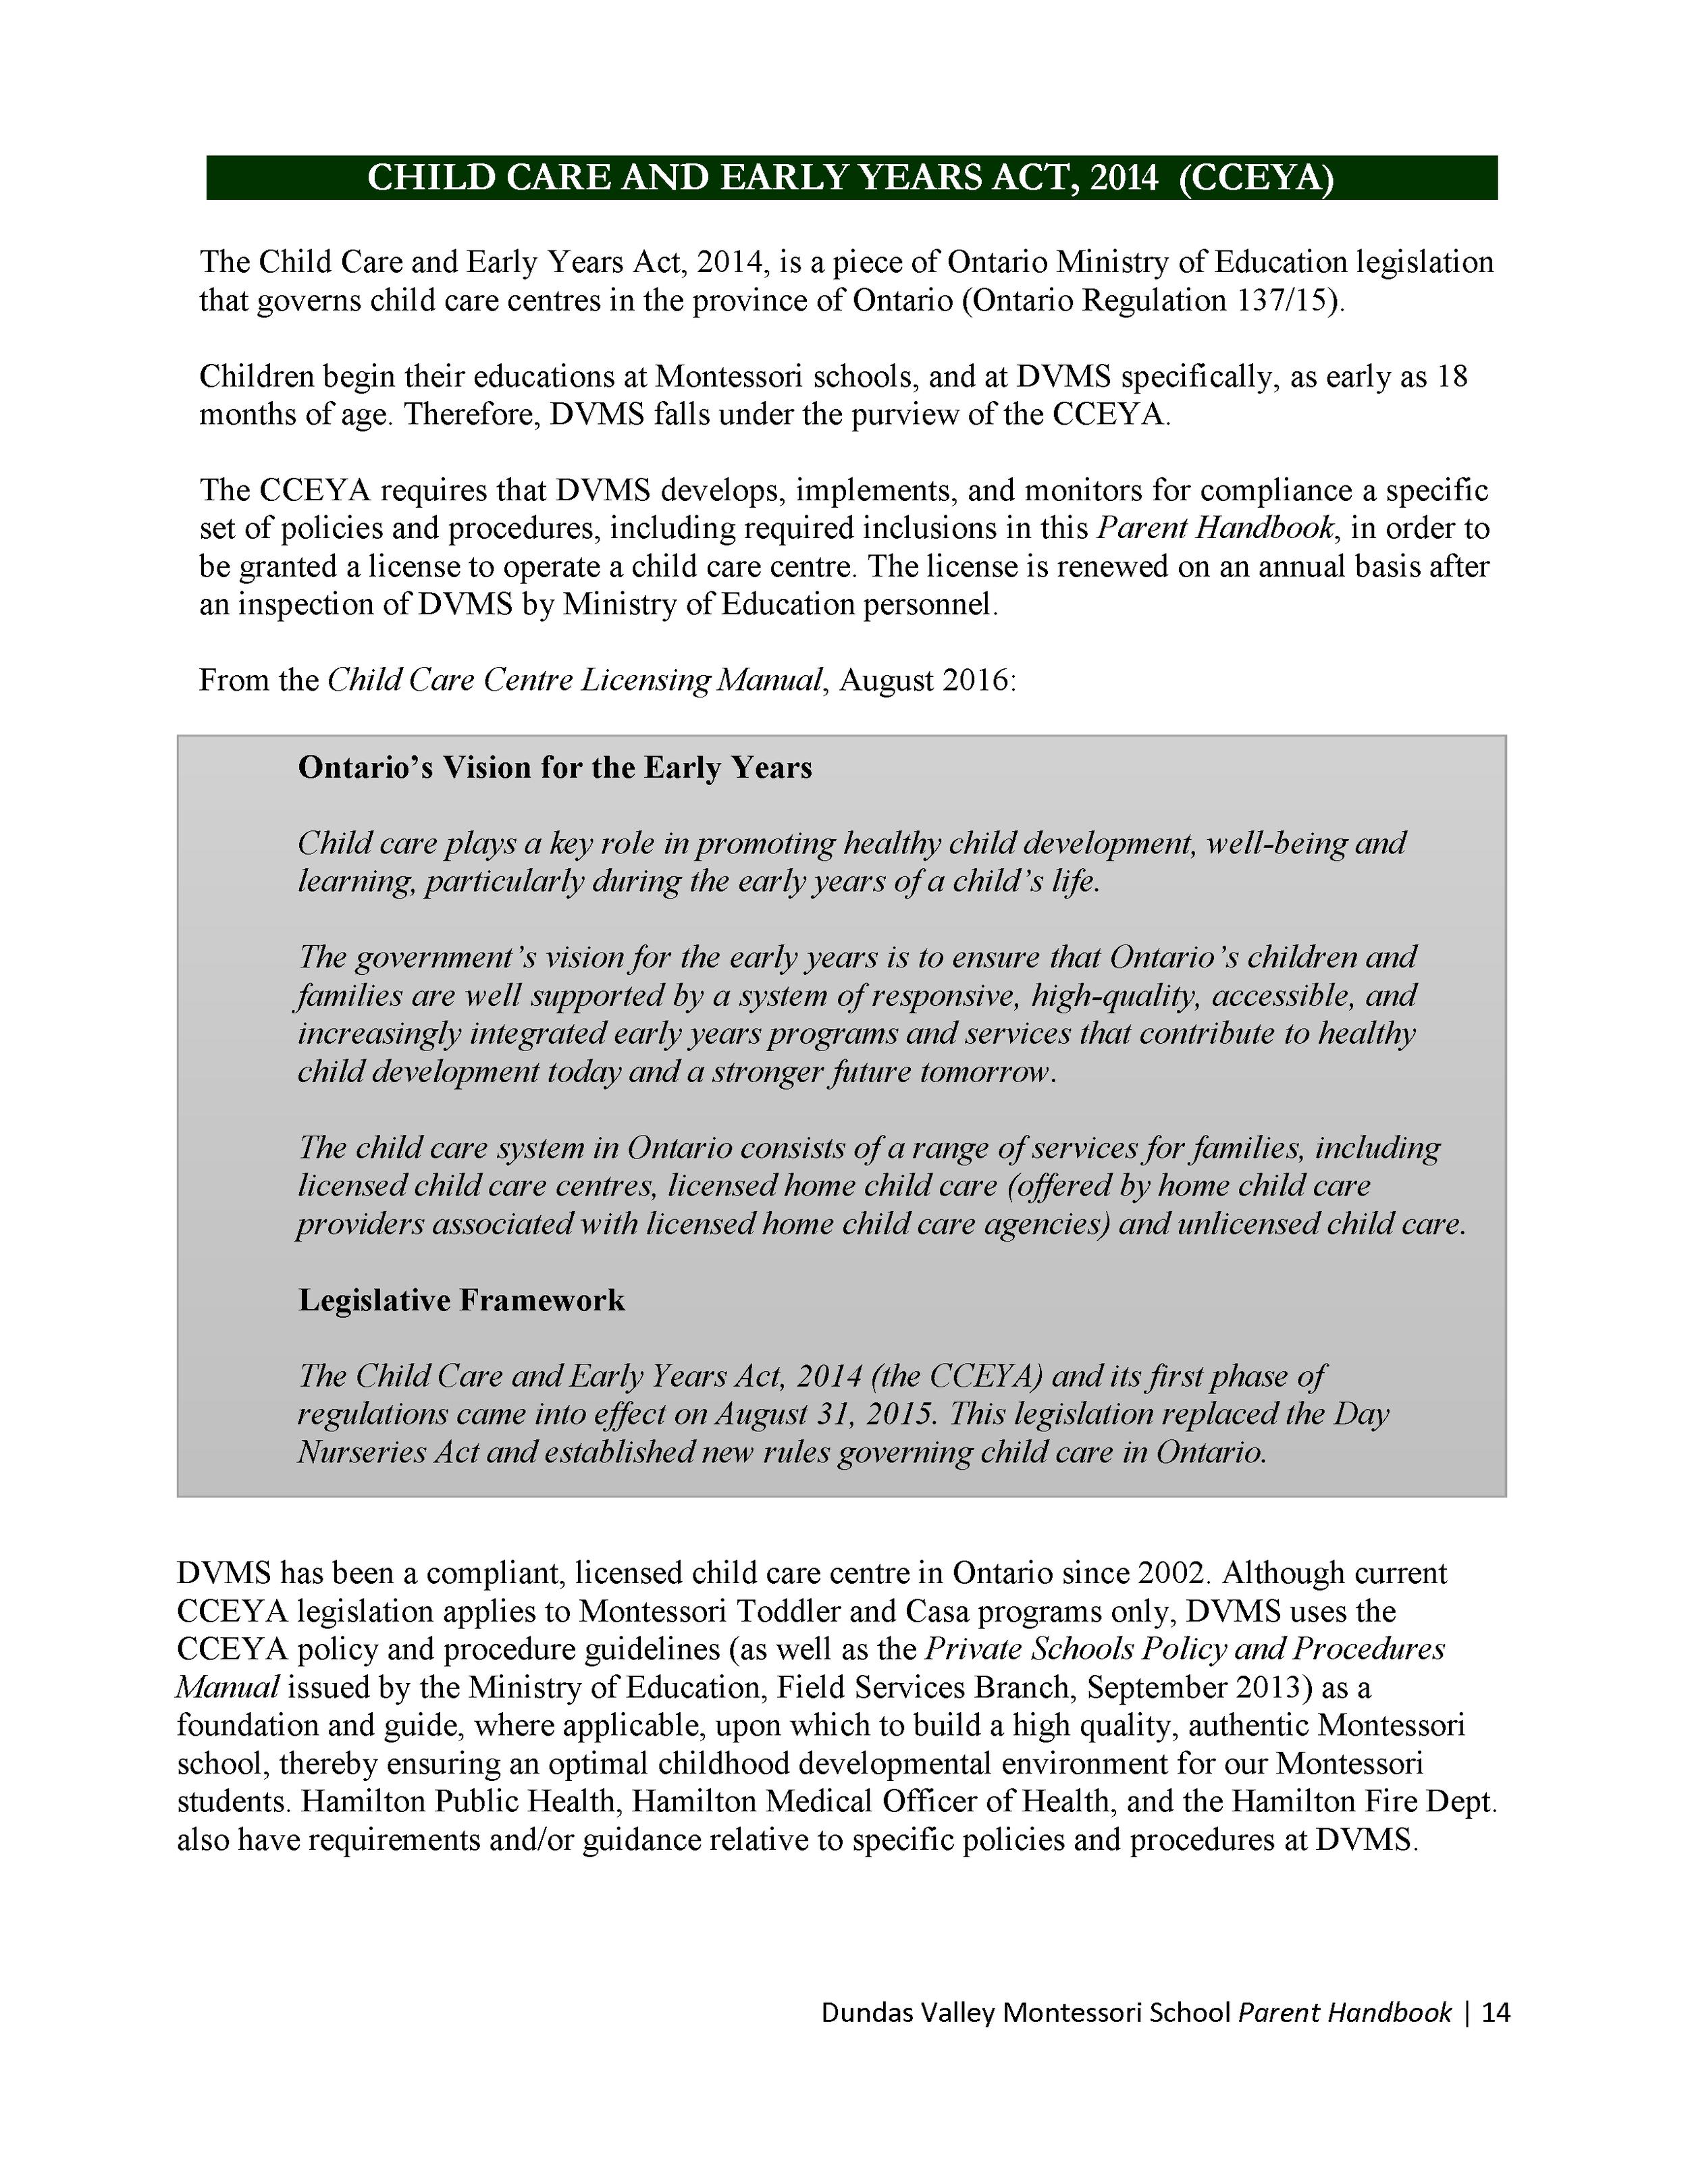 DVMS-Parent-Handbook-19-20_Page_016.png